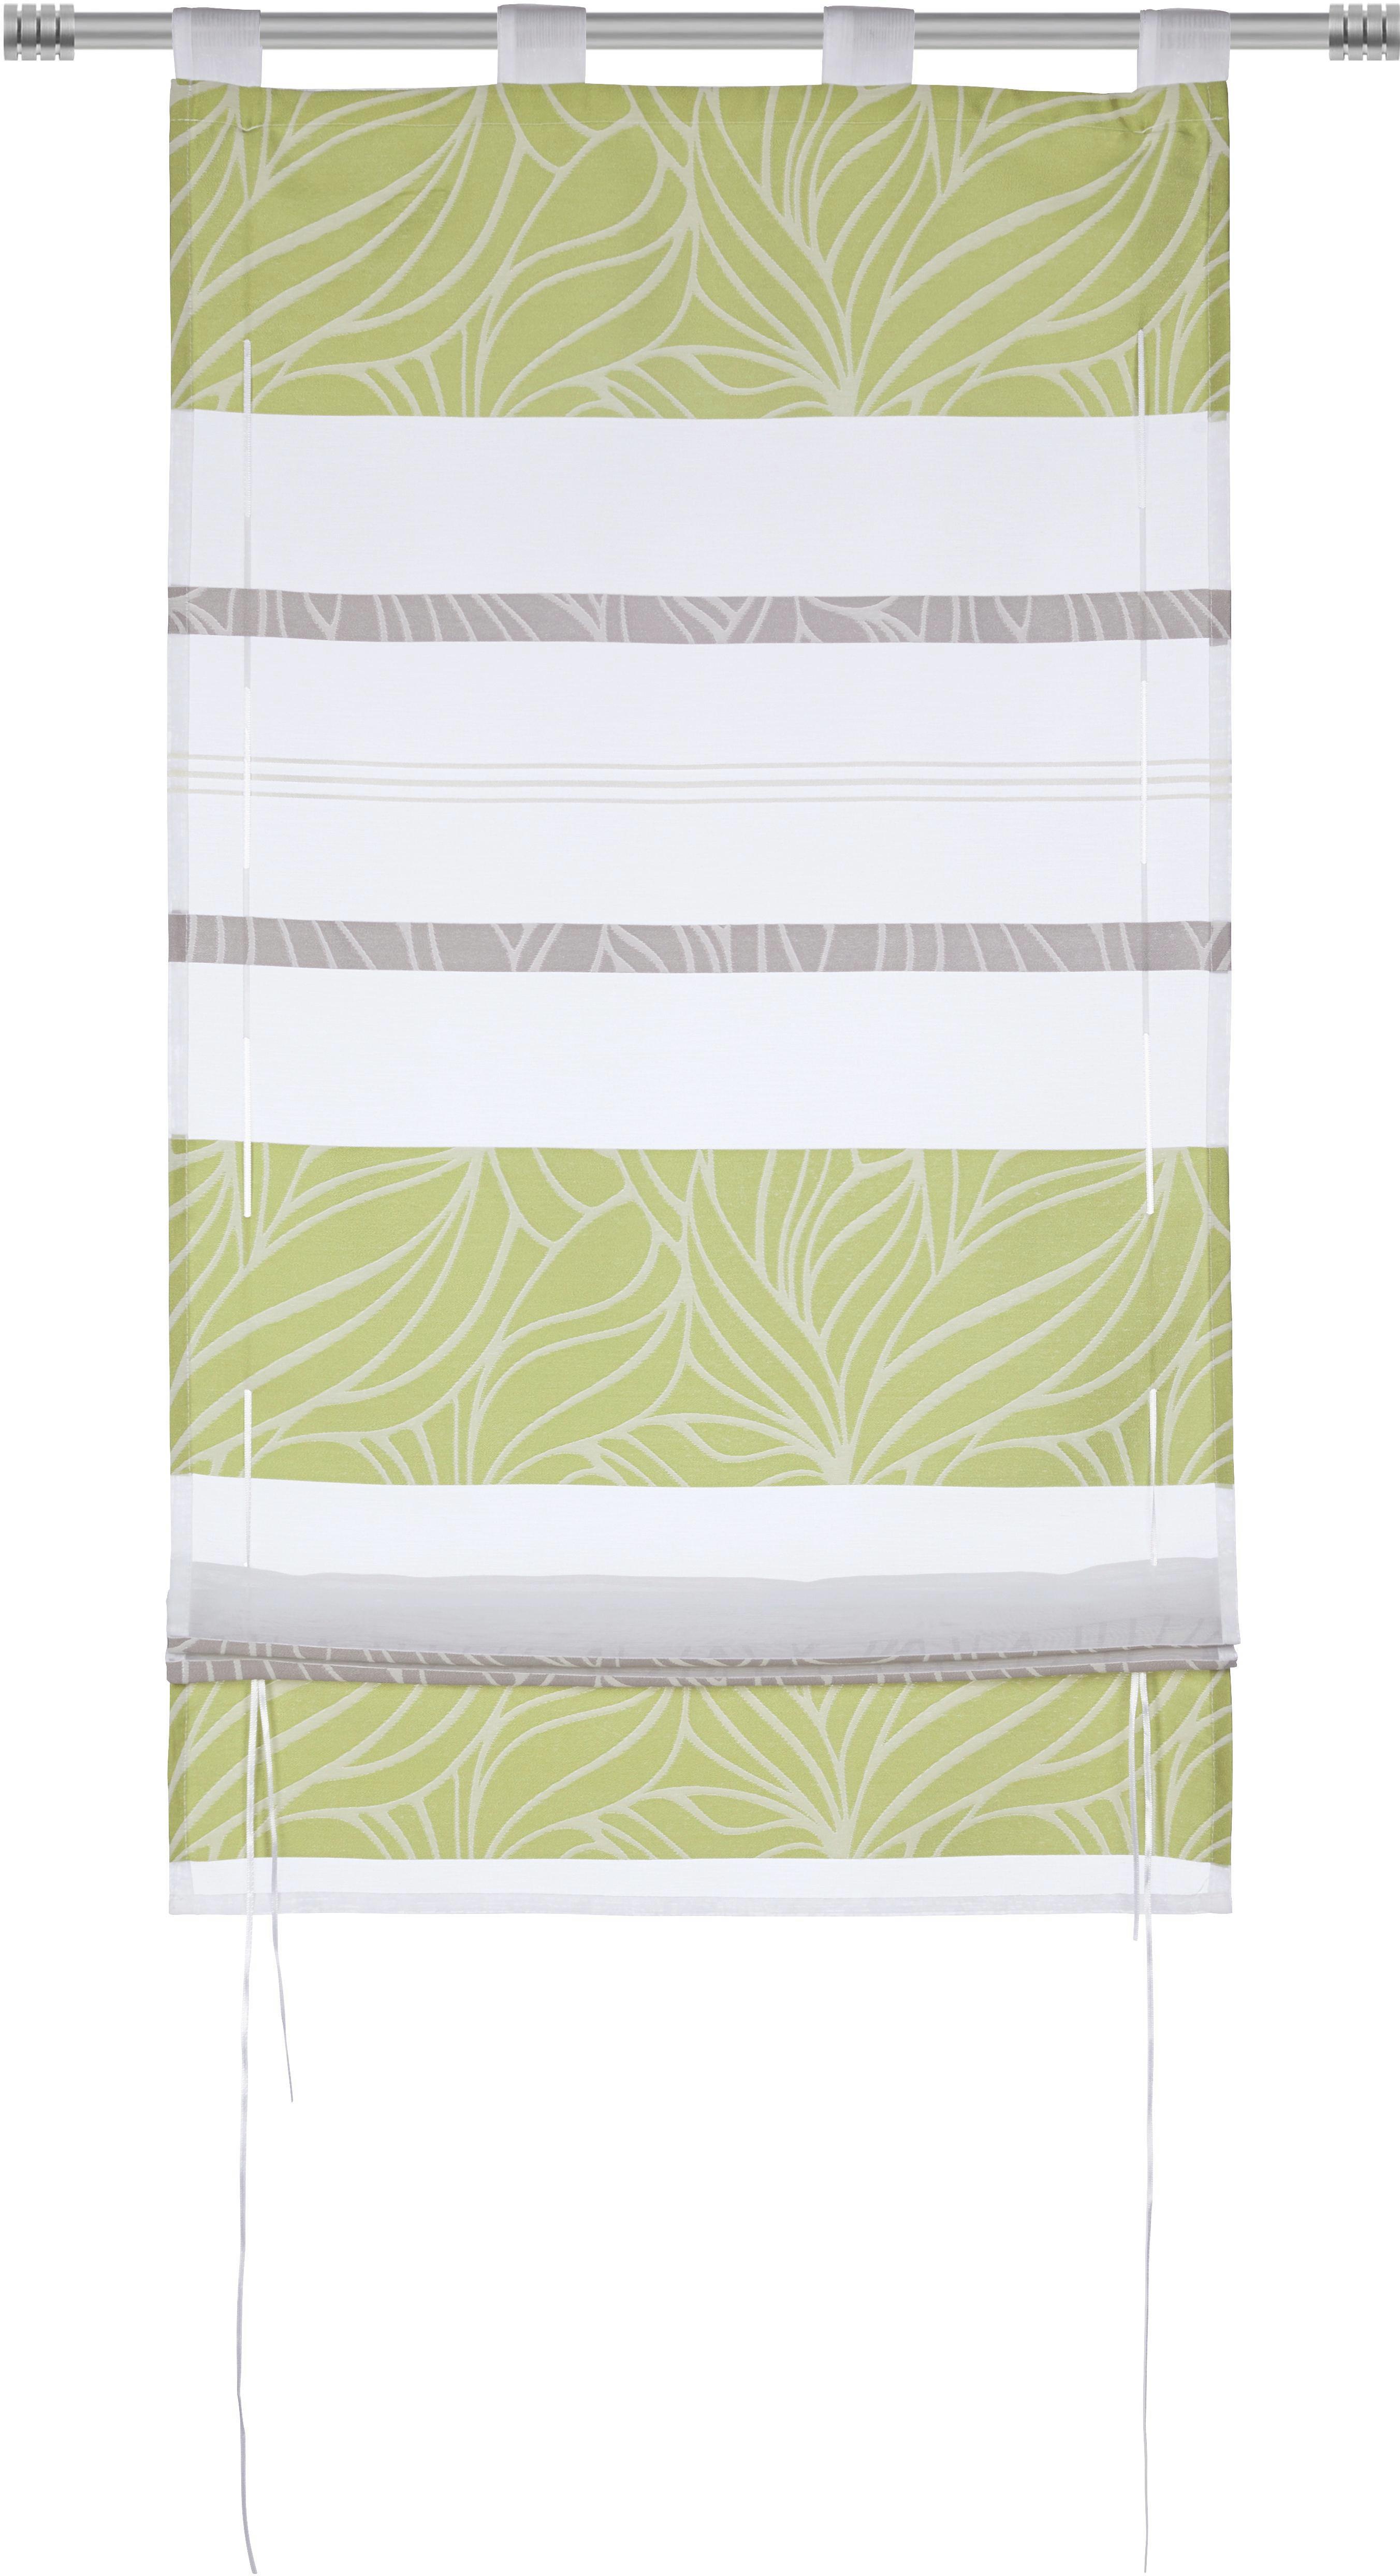 Bändchenrollo Anita, ca. 80x140cm - Grün, KONVENTIONELL, Textil (80/140cm) - MÖMAX modern living